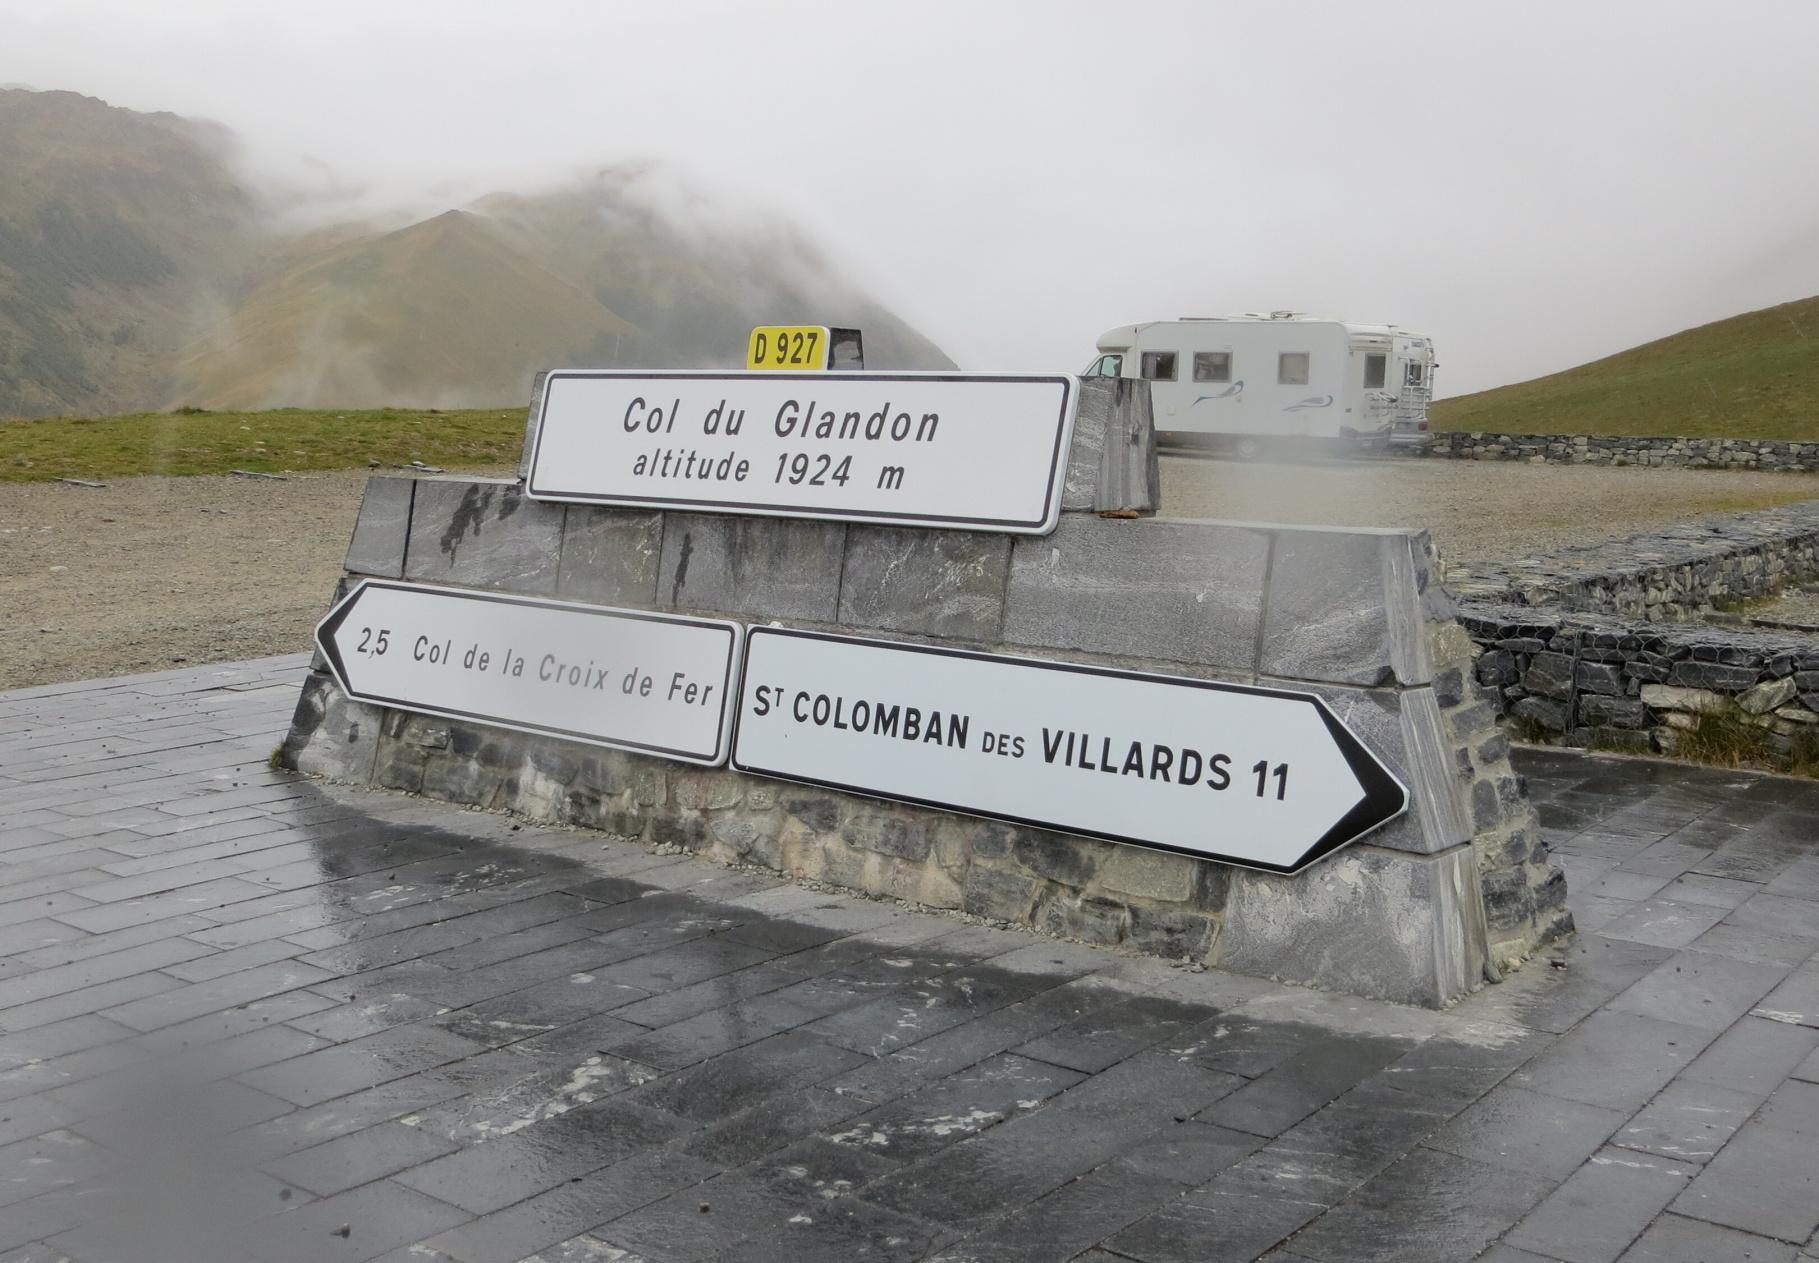 Col du Glanson.